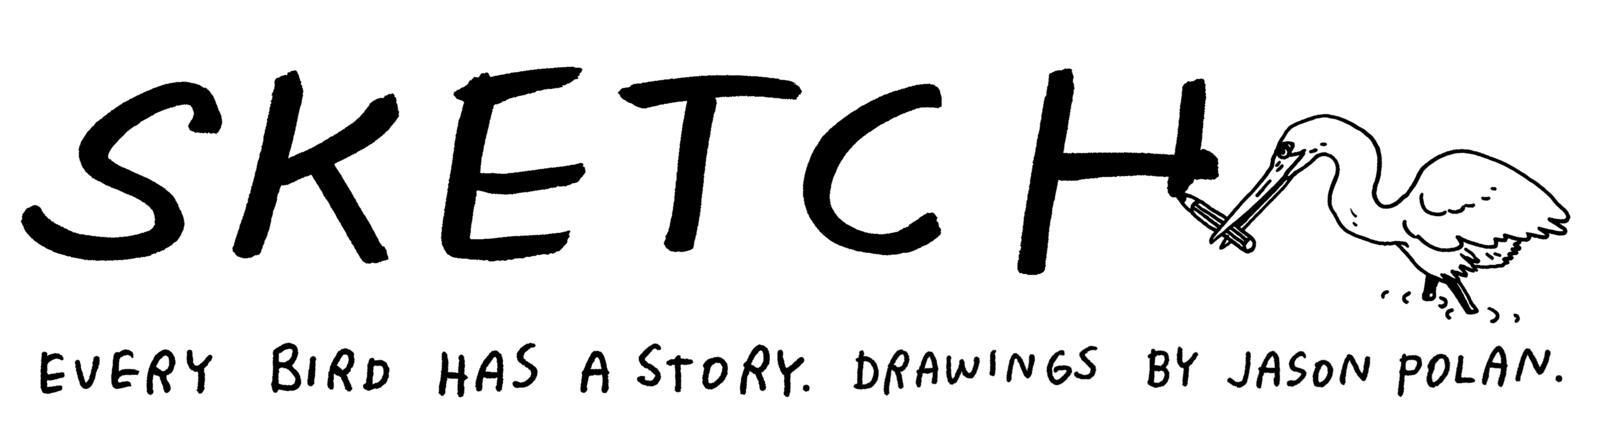 Every bird has a story. Drawings by Jason Polan.